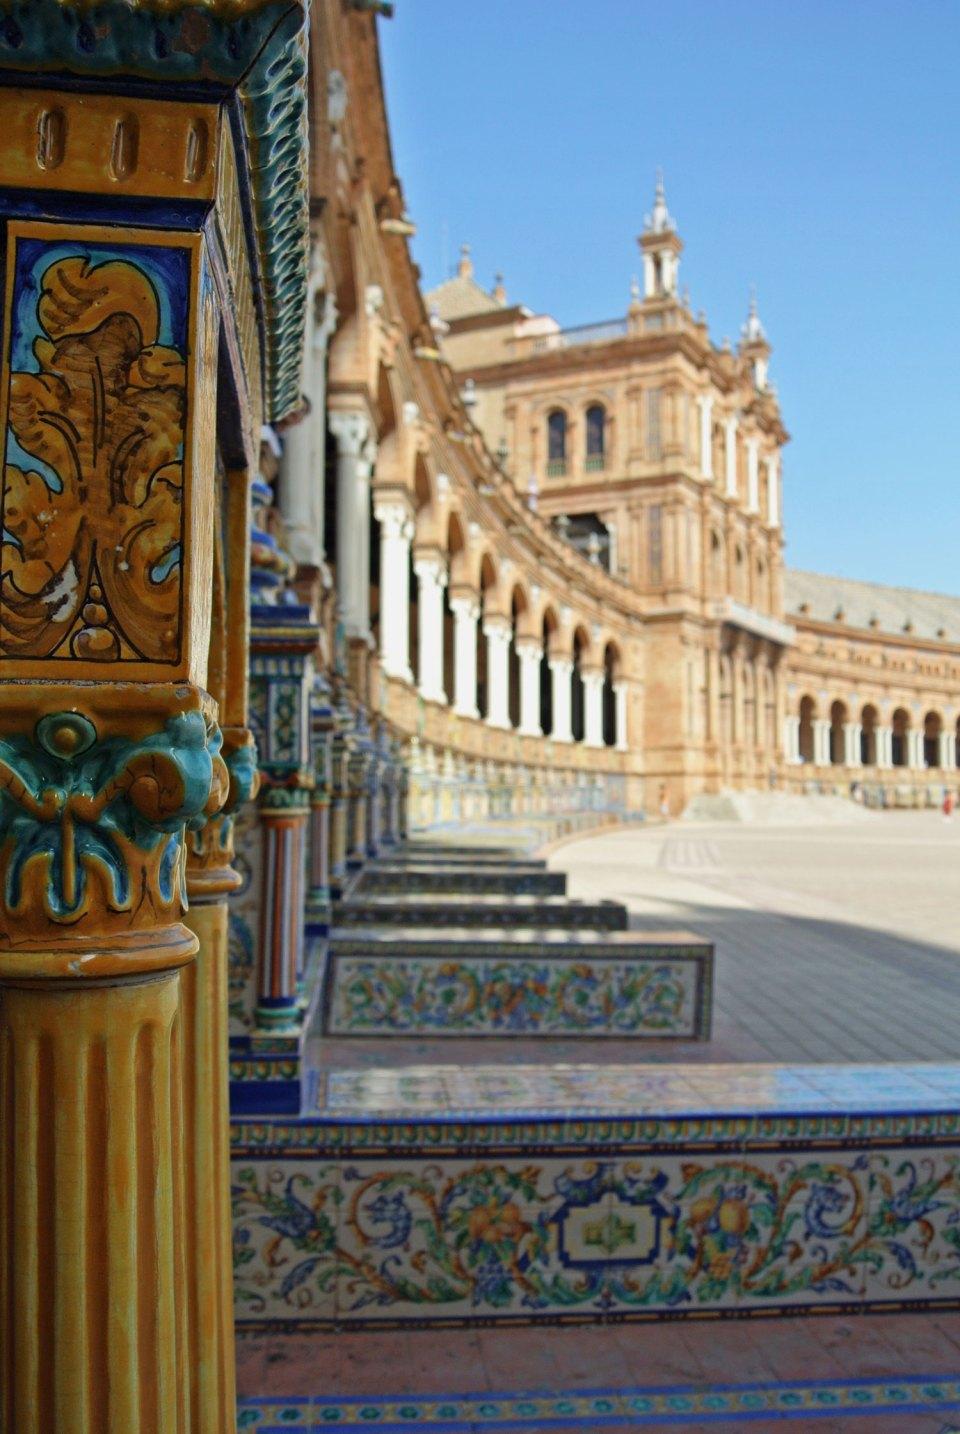 Plaza de España in Andalusien, Spanien